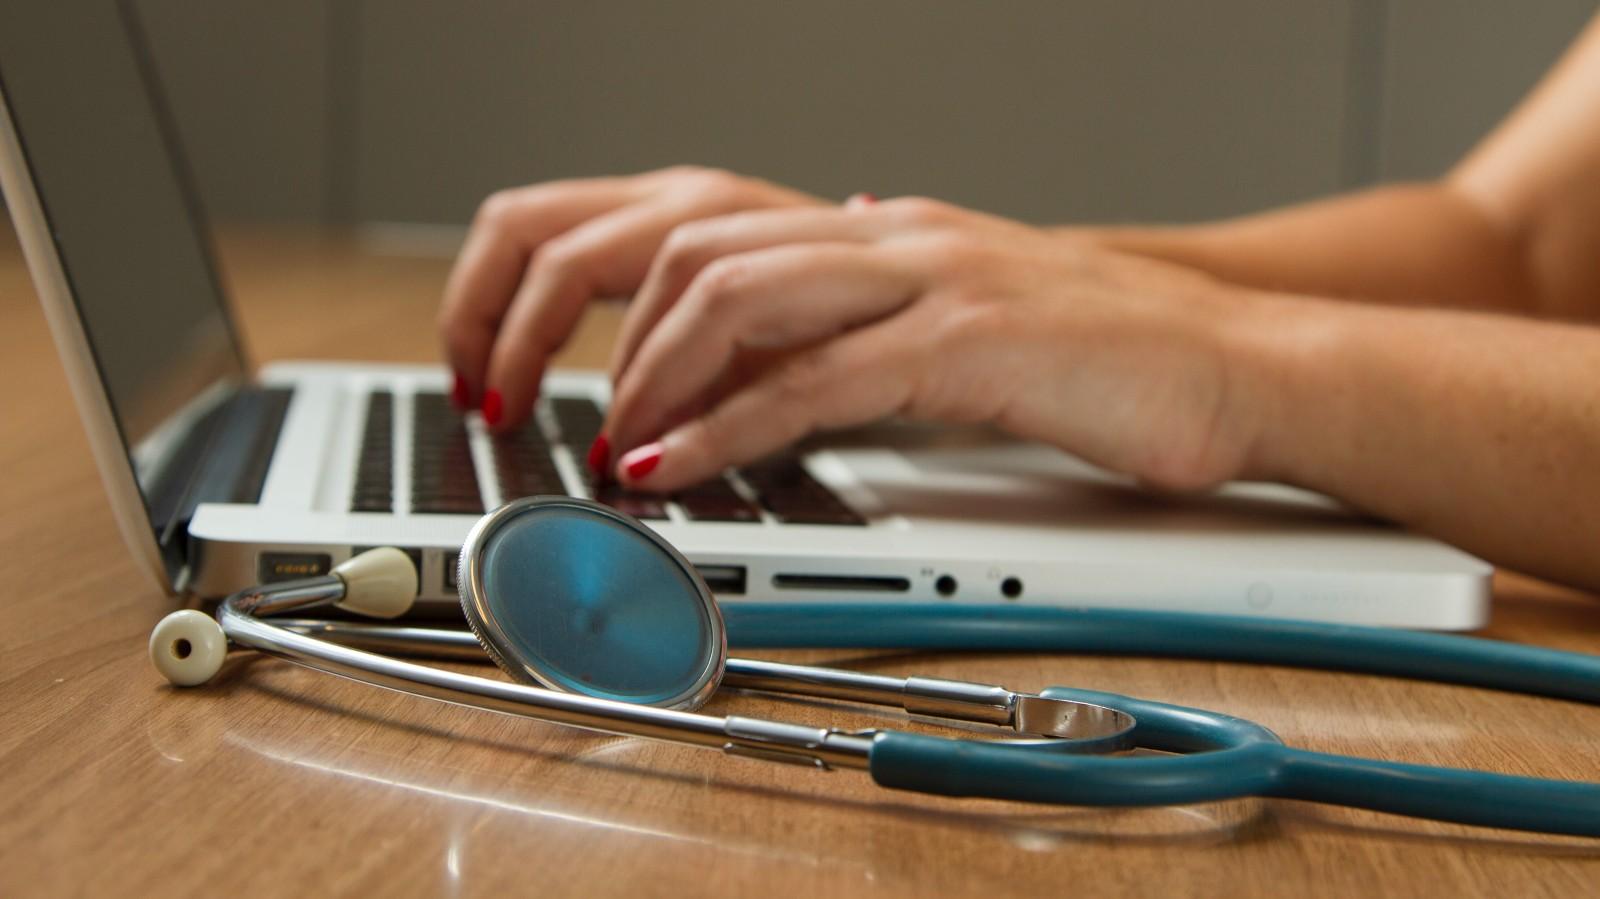 Digital Health Investments In Israel Soar During Pandemic